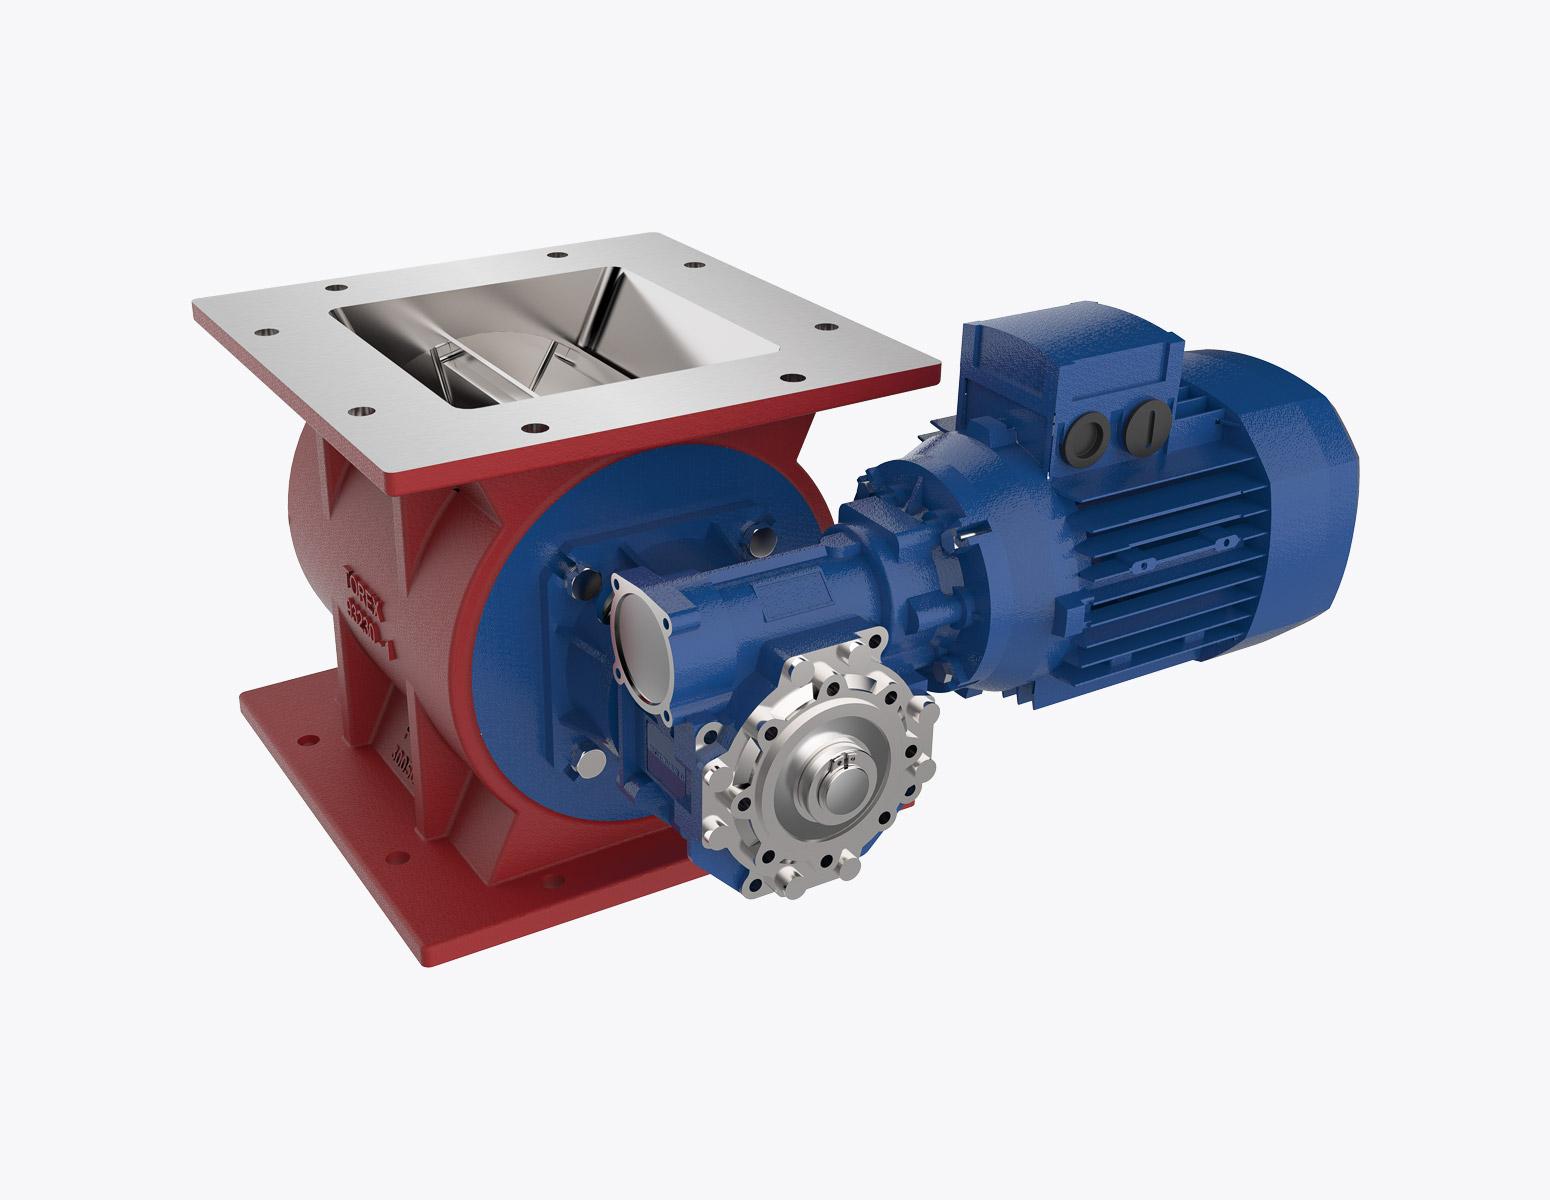 rotovalvola-industrial-vacuum-cleaners-ivision-vacuum